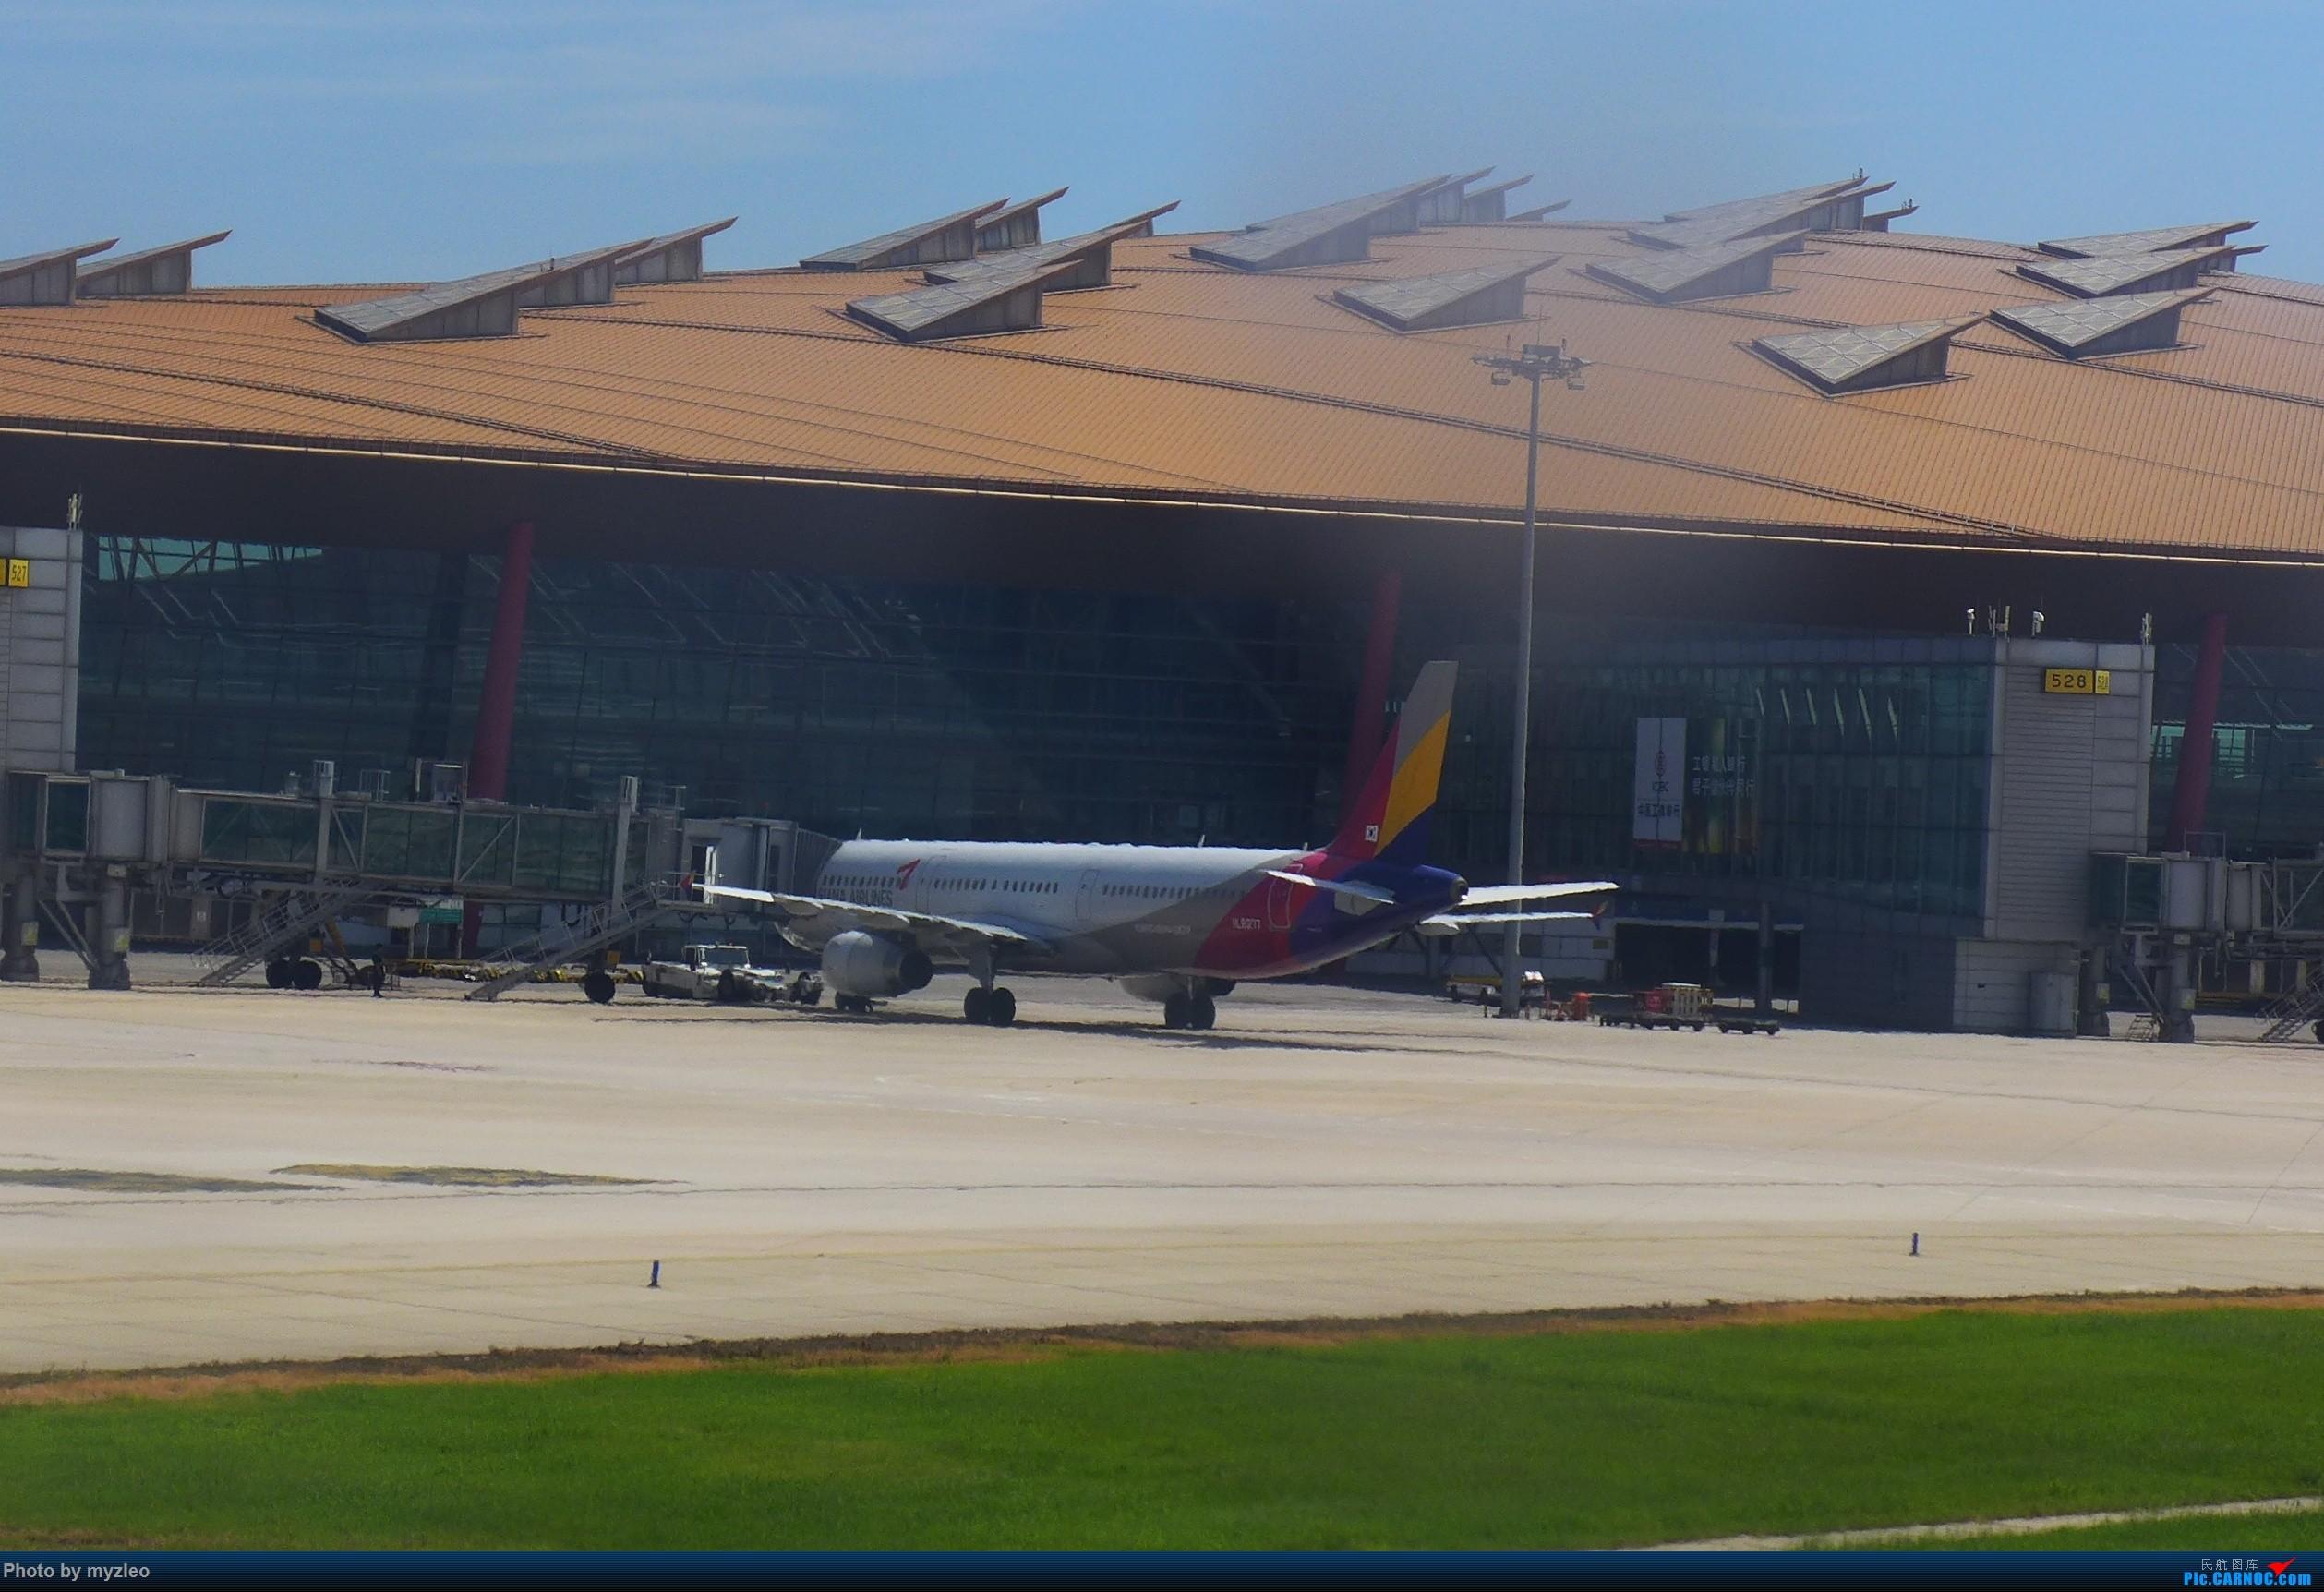 Re:[原创]【myzleo的游记3.1】三访帝都——记一次意外的惊喜,大鹅头初遇,第一次去中关村 AIRBUS A321 HL8277 中国北京首都国际机场